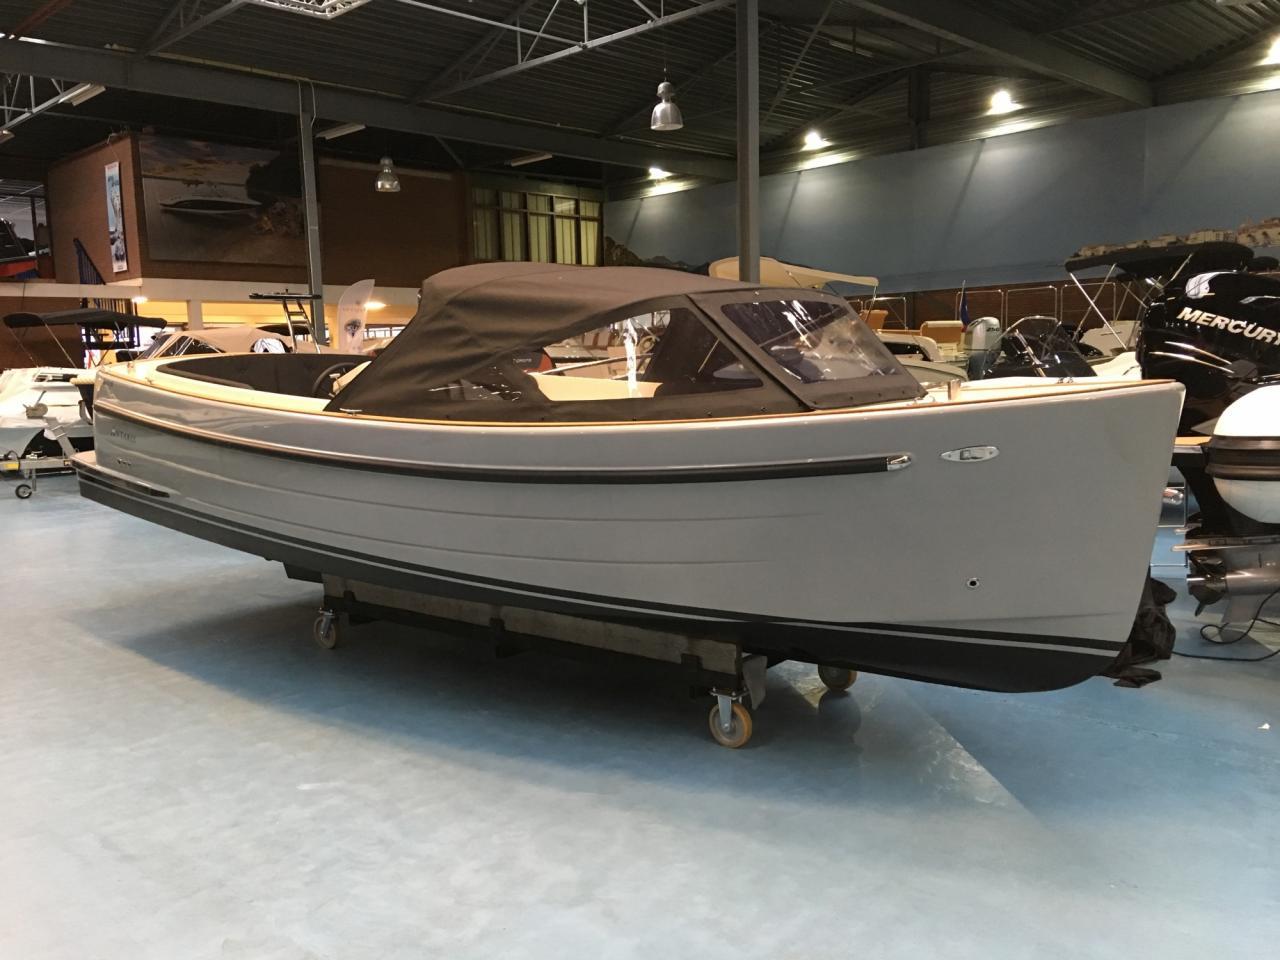 Antaris sixty6 grijs met 42 pk Vetus 1